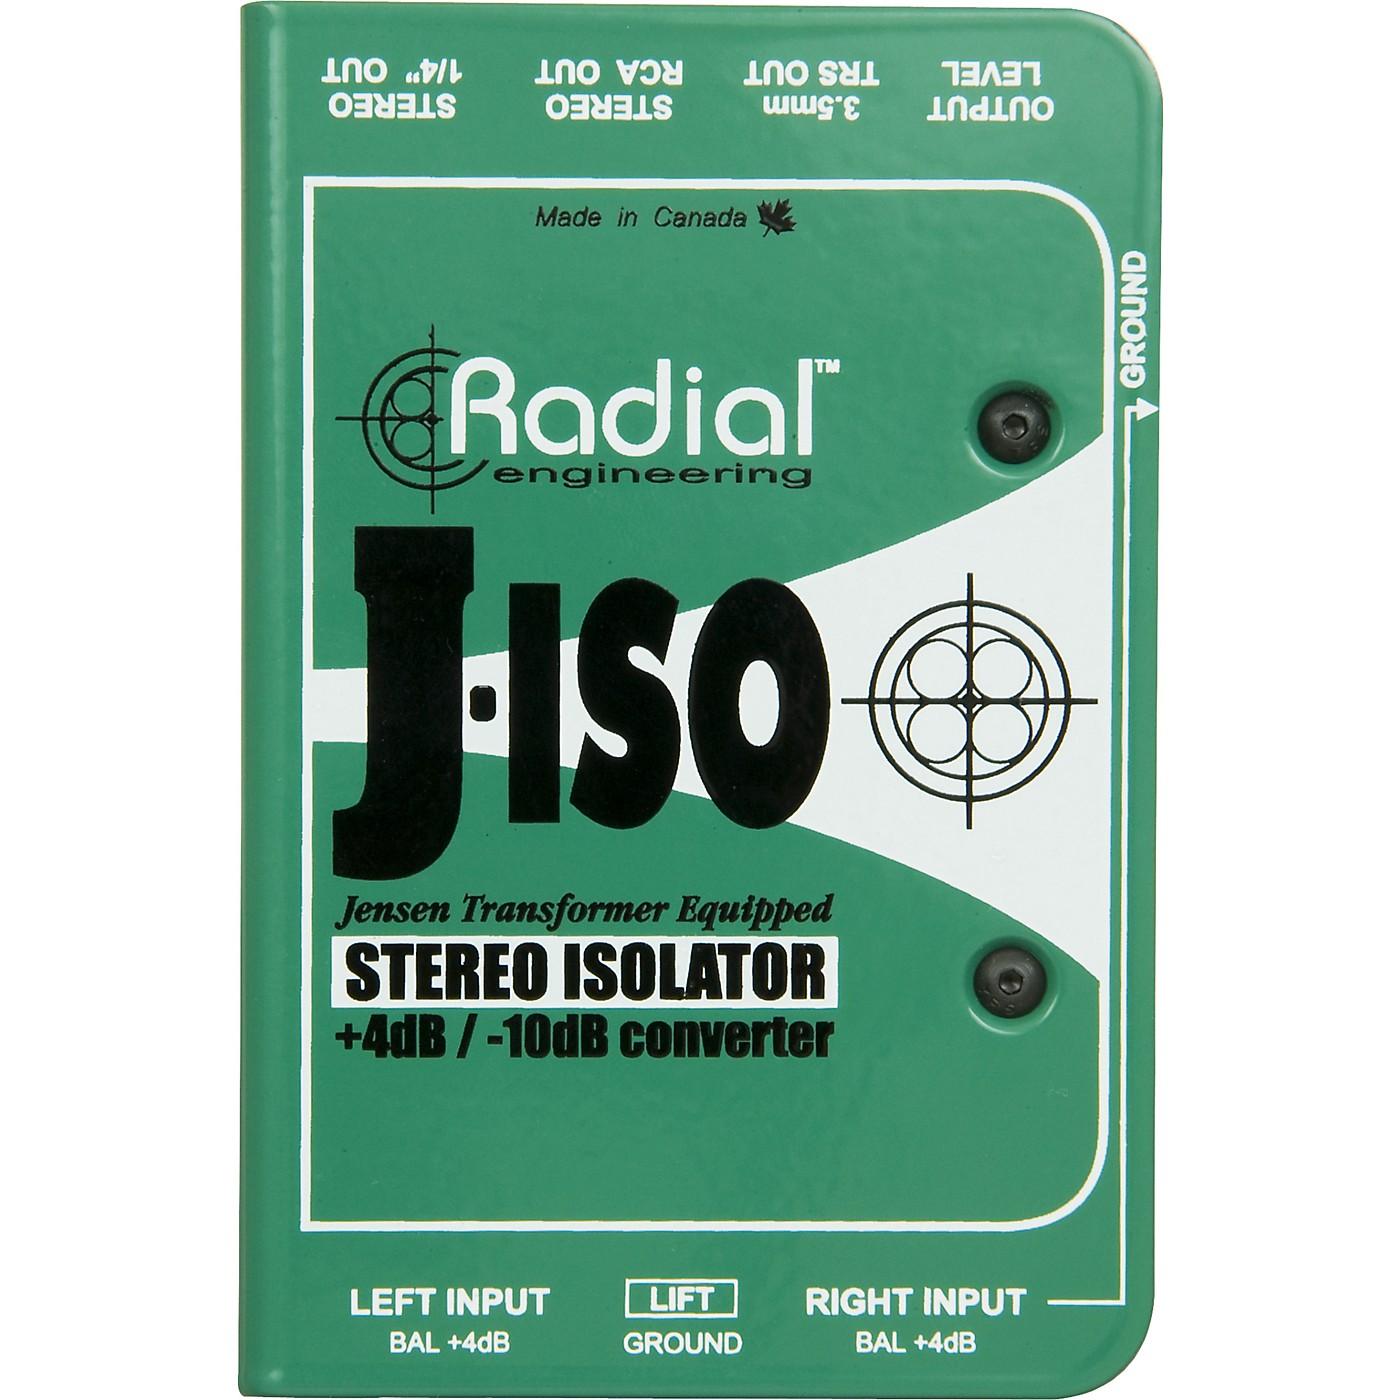 Radial Engineering J-ISO Jensen Transformer Equipped Stereo Isolator +4dB to -10dB Converter thumbnail